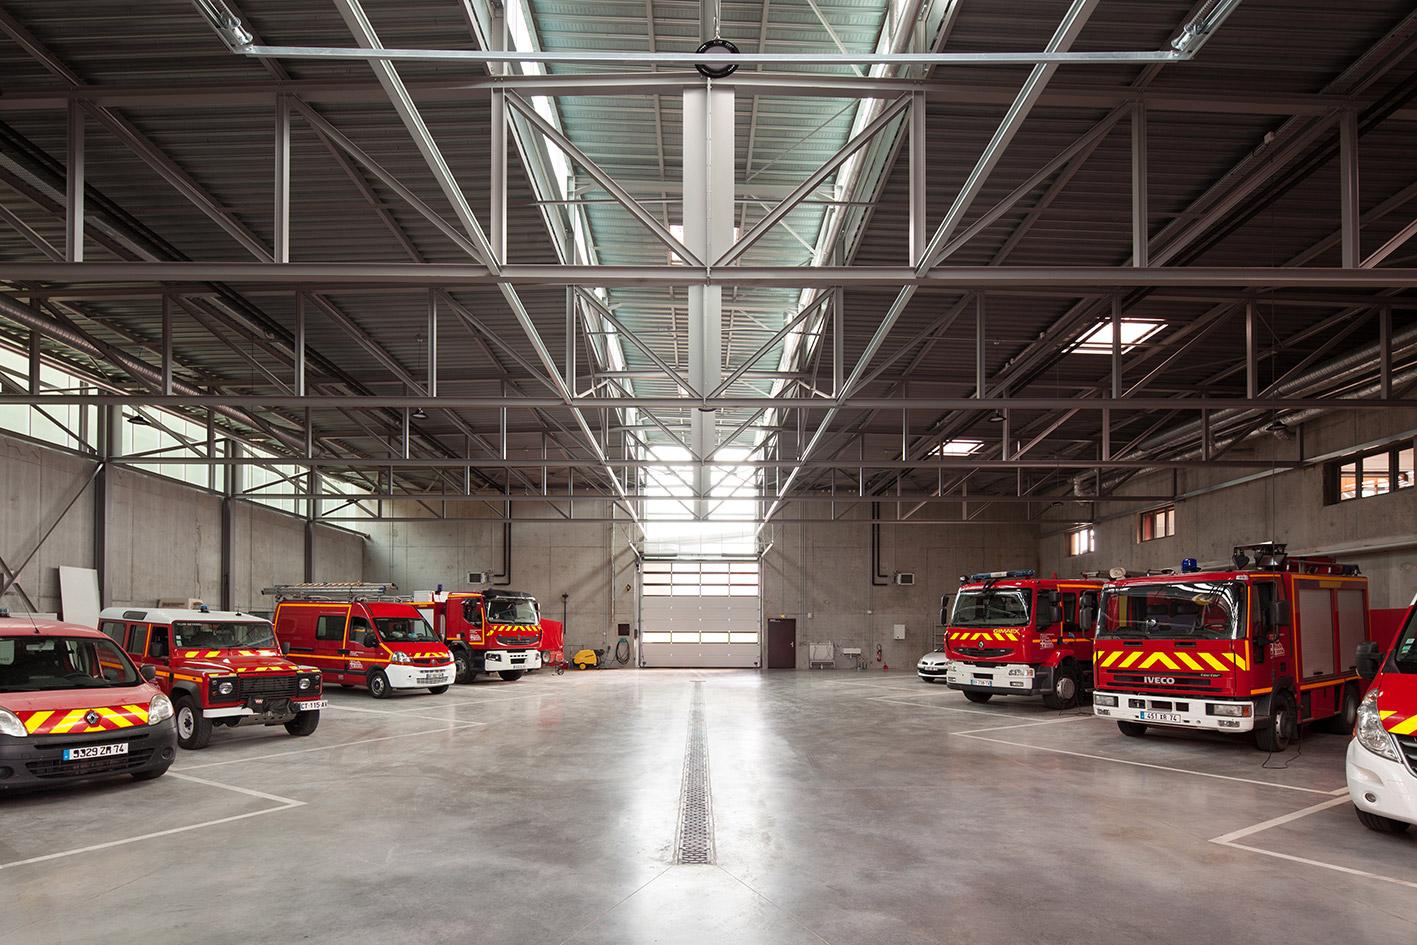 jerome-ricolleau-photographe-architecture-lyon-Composite-grenoble-sdis-caserne-pompiers-seyssel-7